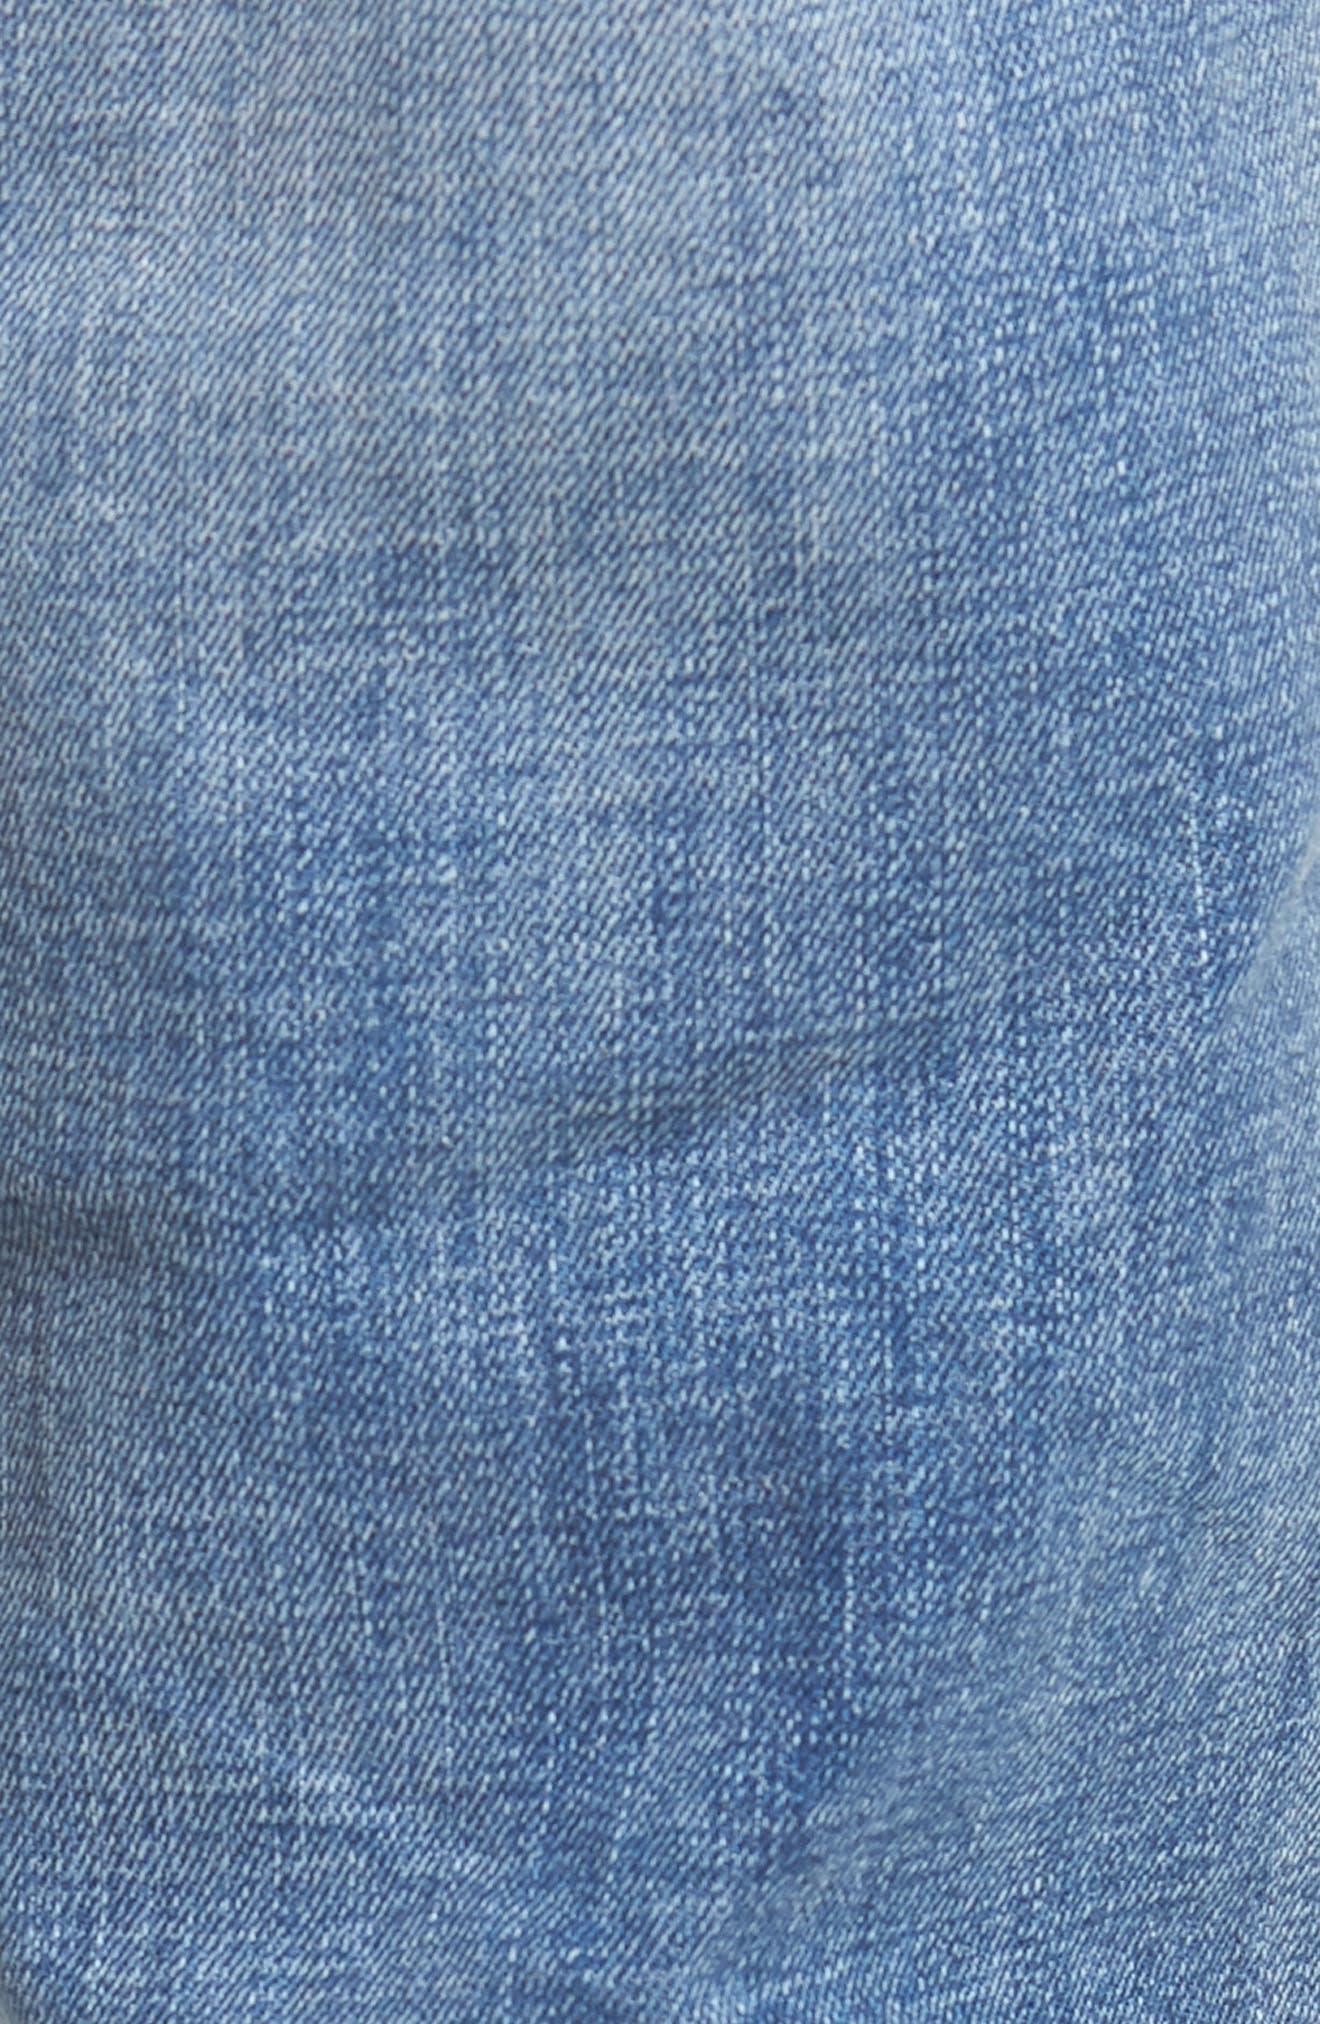 Blake Slim Fit Jeans,                             Alternate thumbnail 5, color,                             Eagle Rock